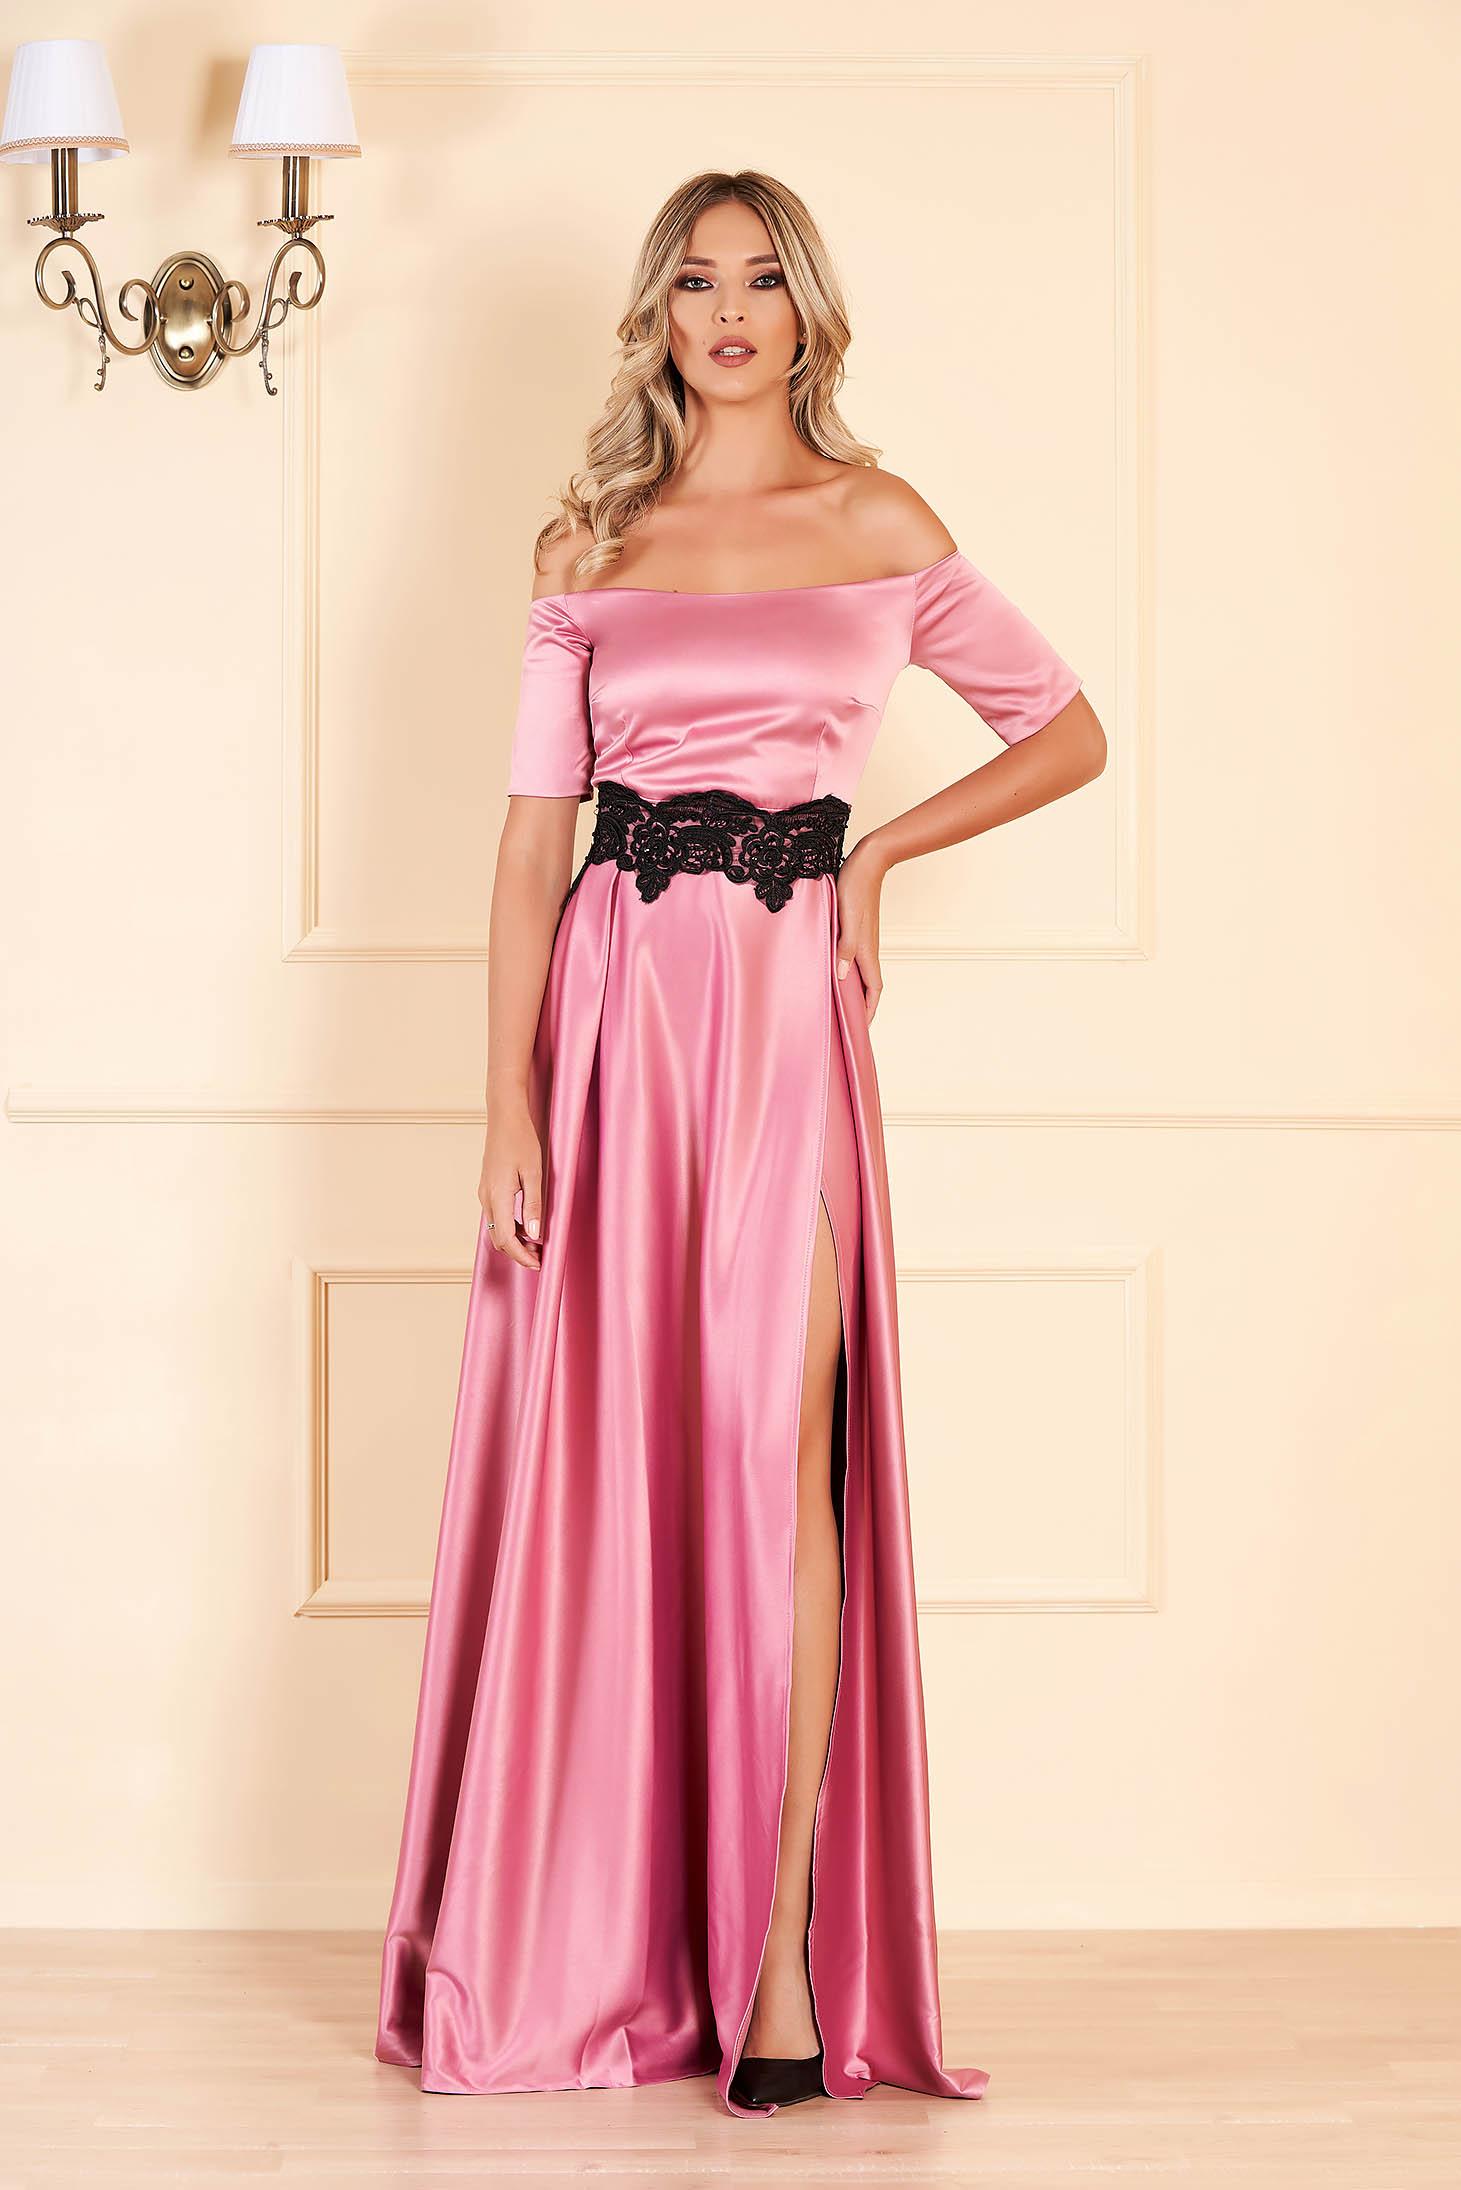 Rochie roz lunga de ocazie in clos din material satinat cu insertii de broderie